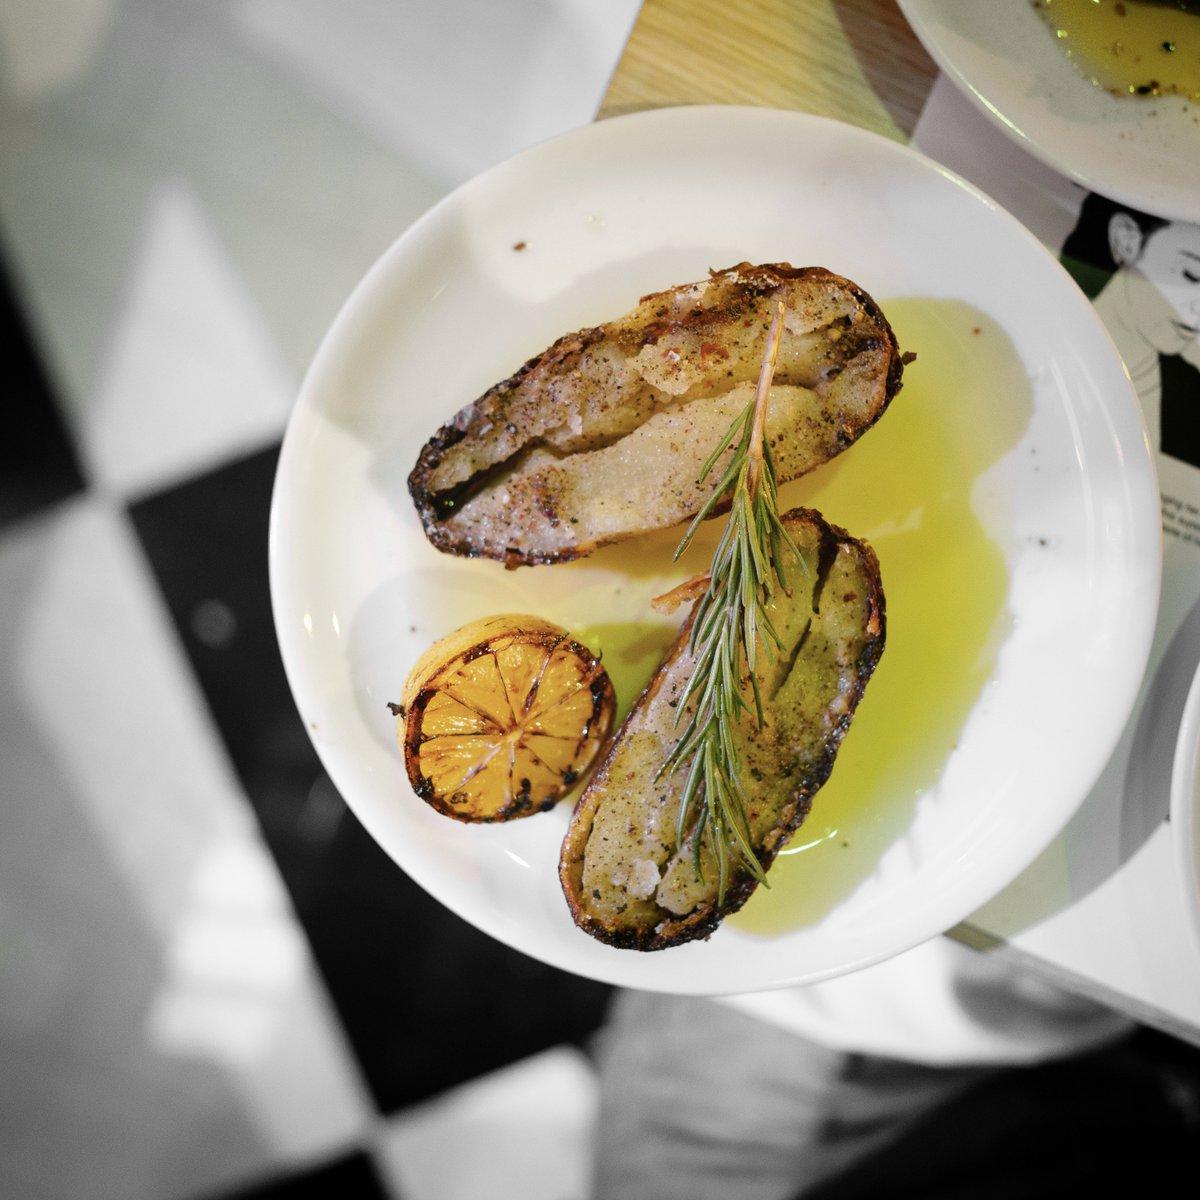 Adam Goldberg On Twitter Seaport Food Lab New York A Few Photos